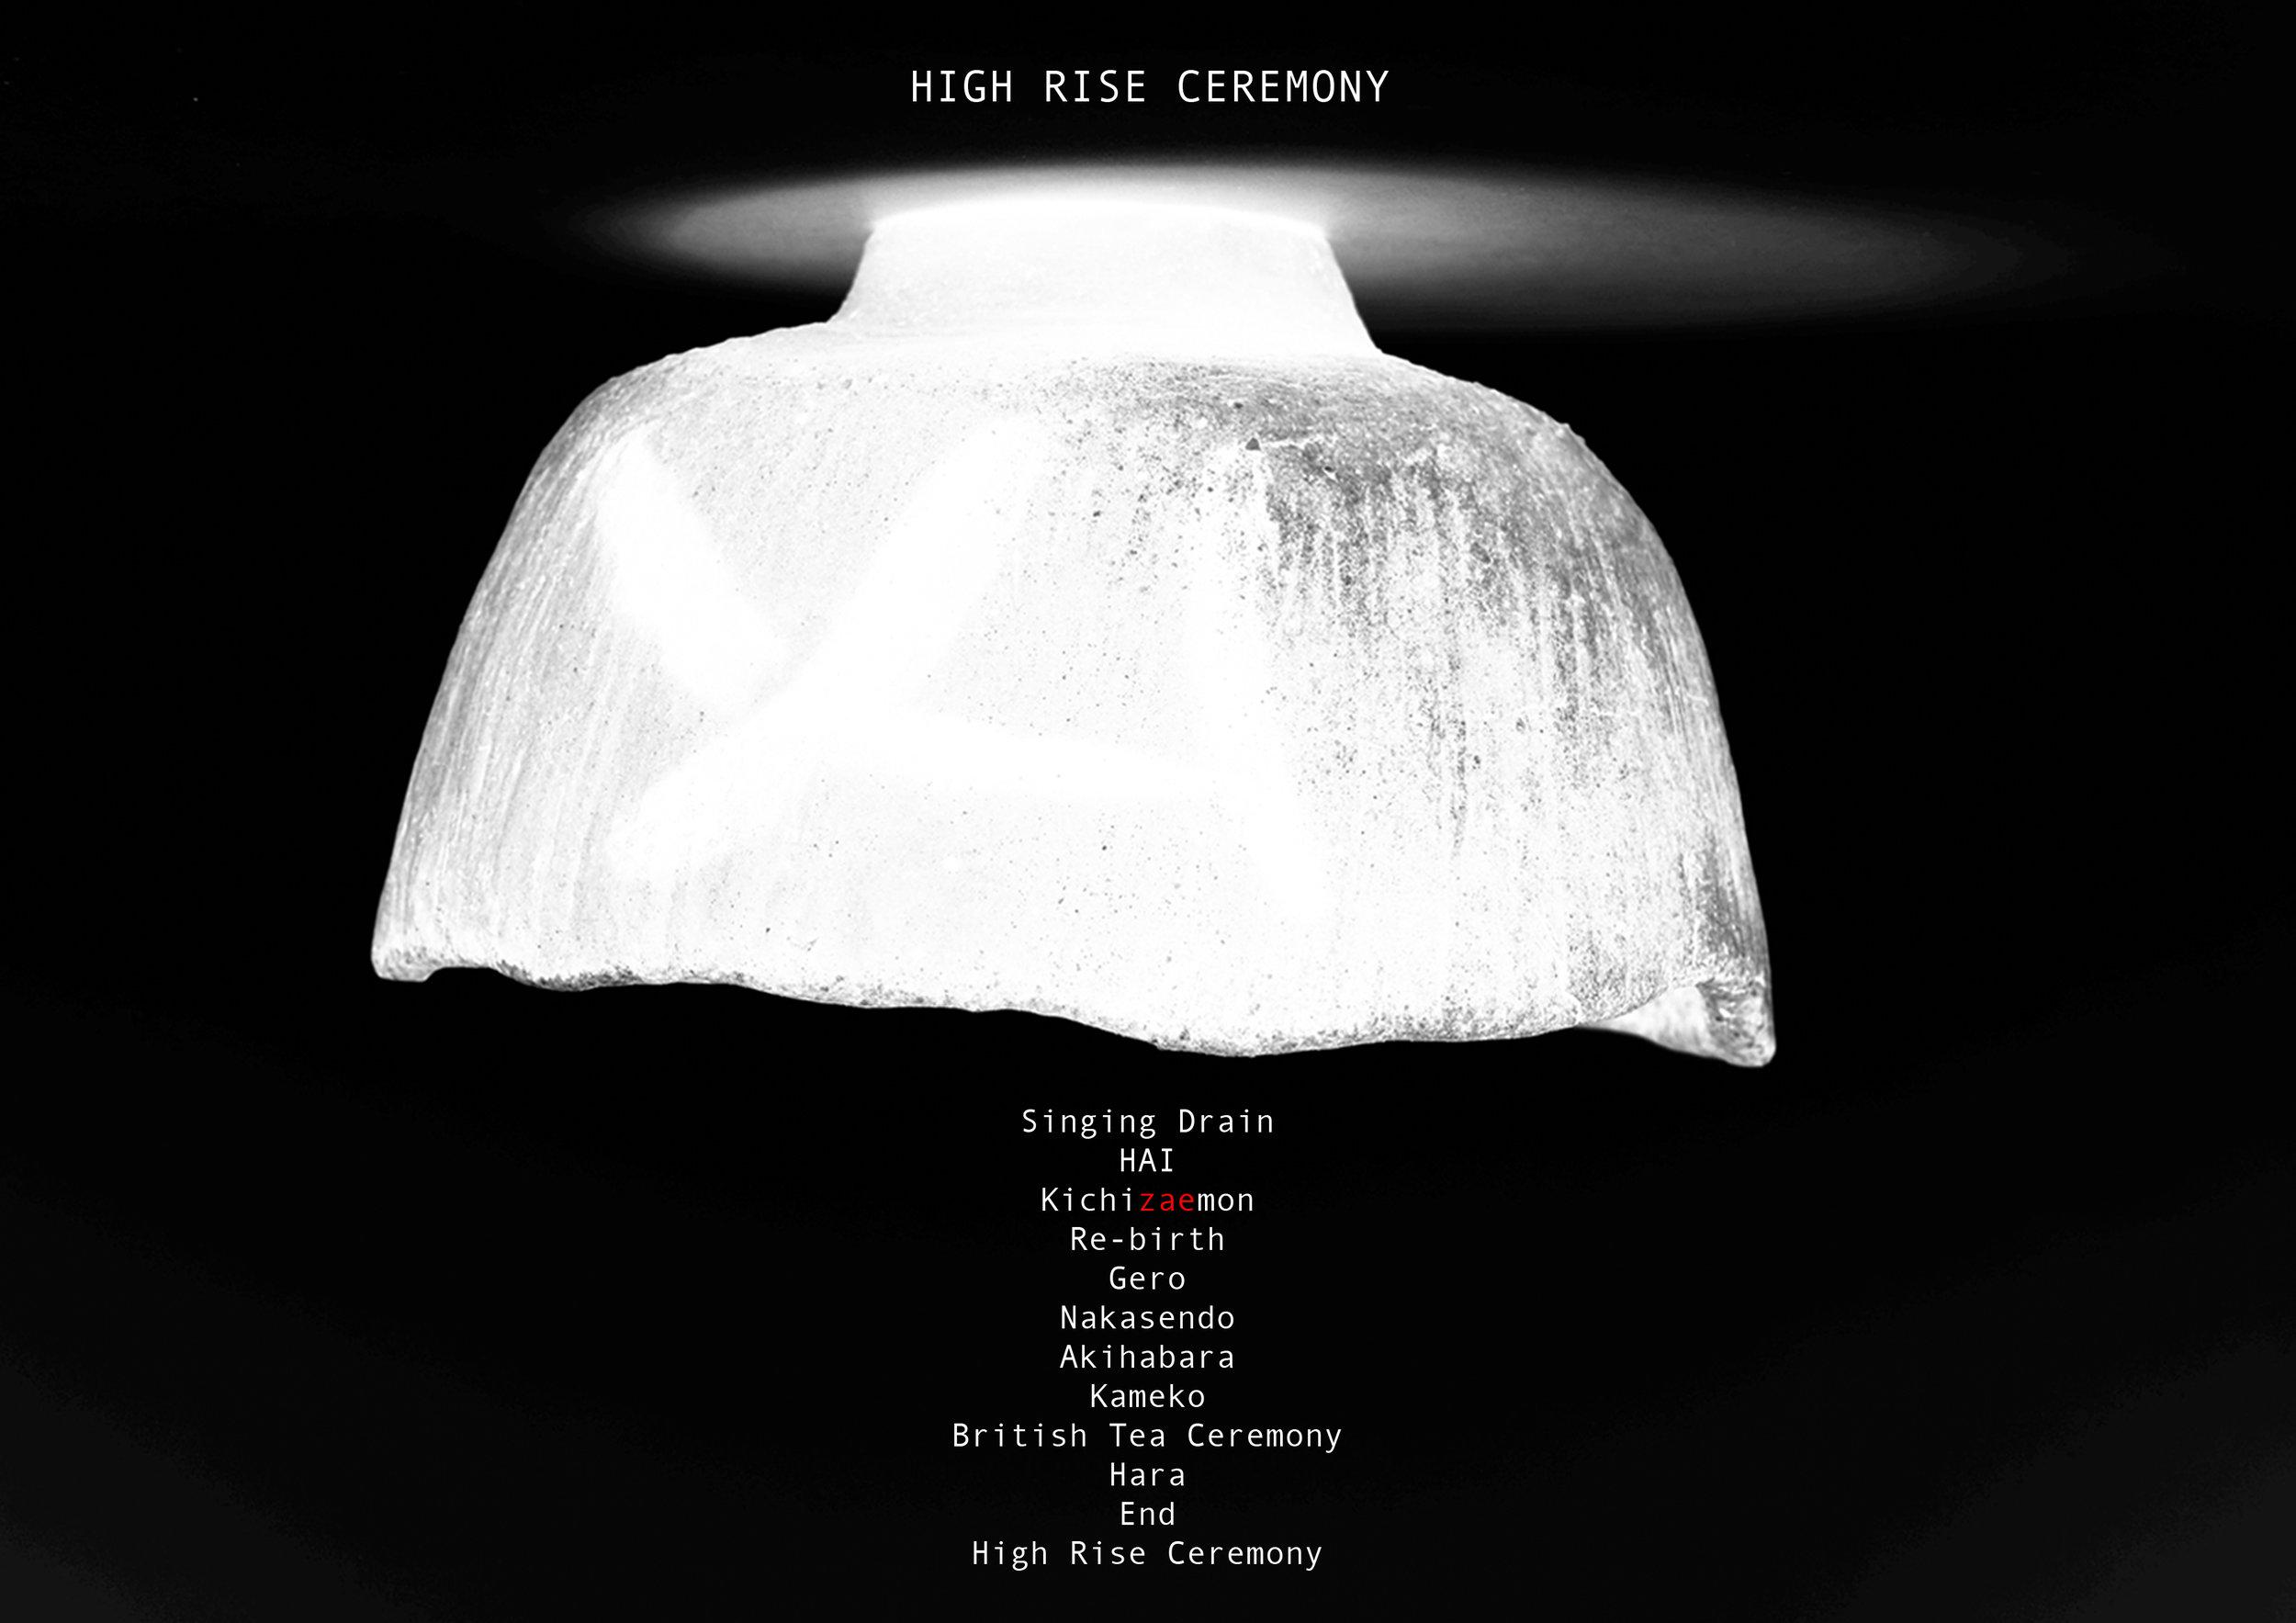 High Rise Ceremony (2017)